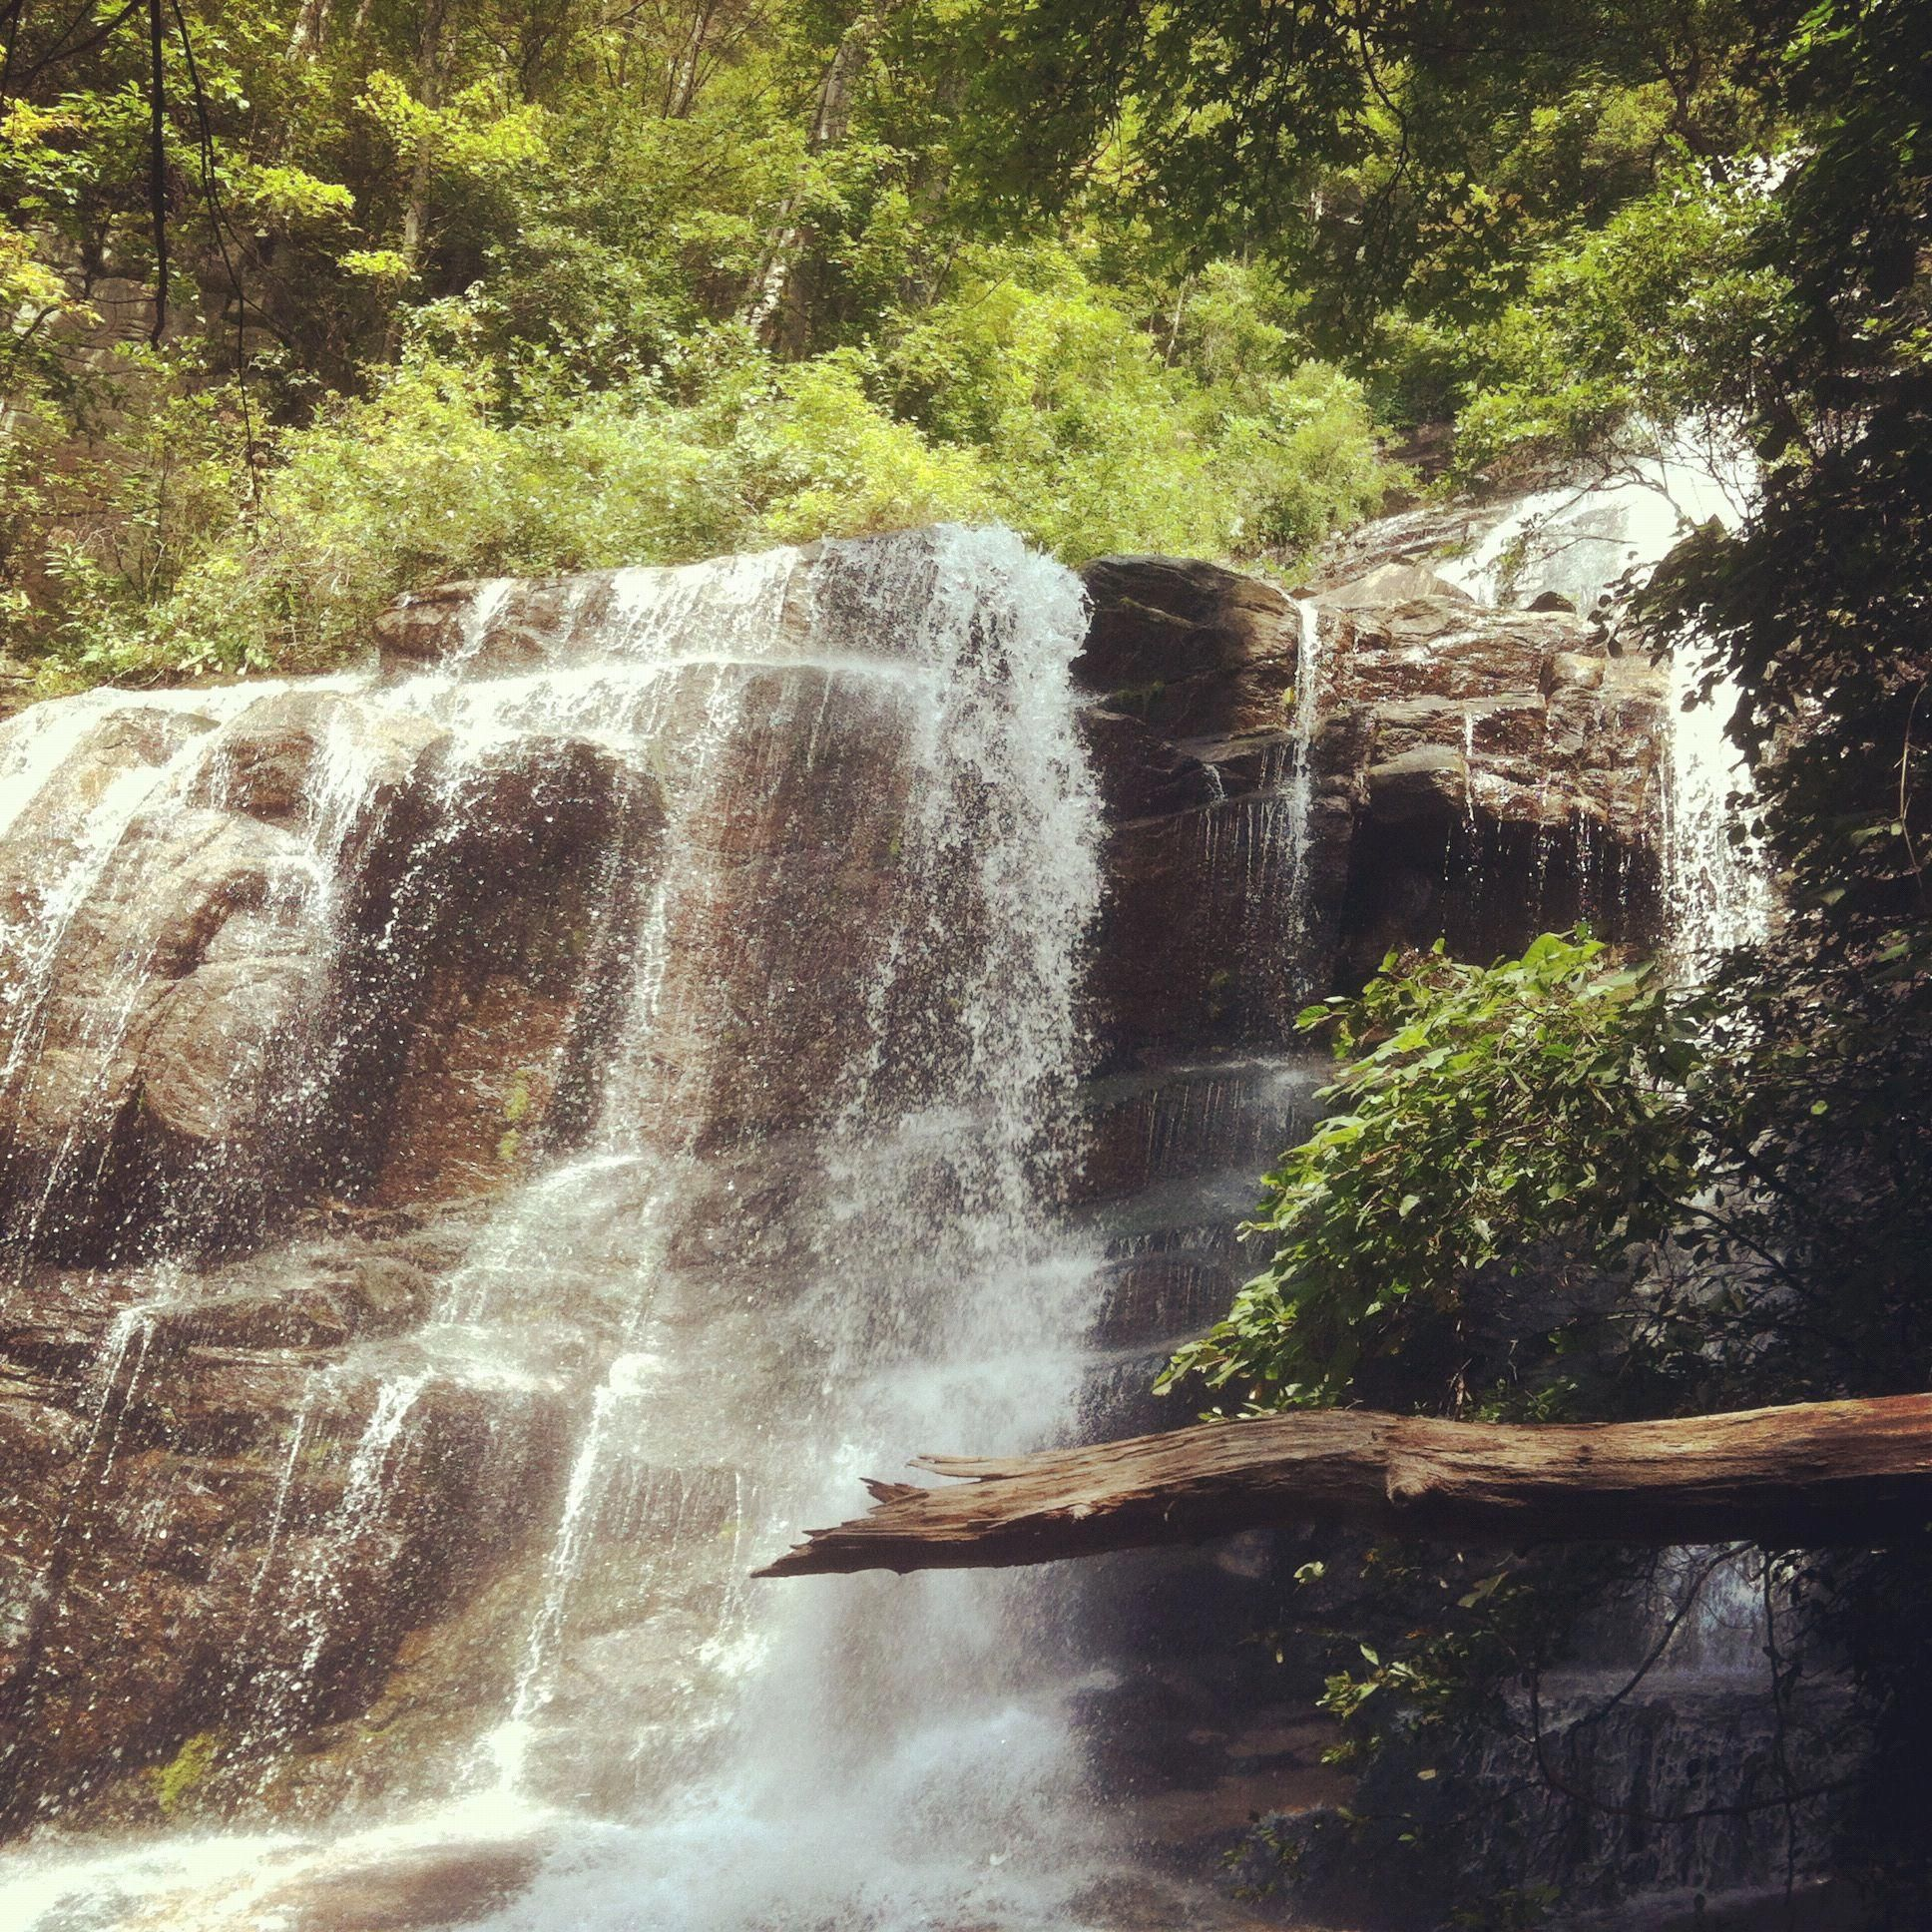 """Depicted In The Photo Is Falls Creek Falls, Near Jones"